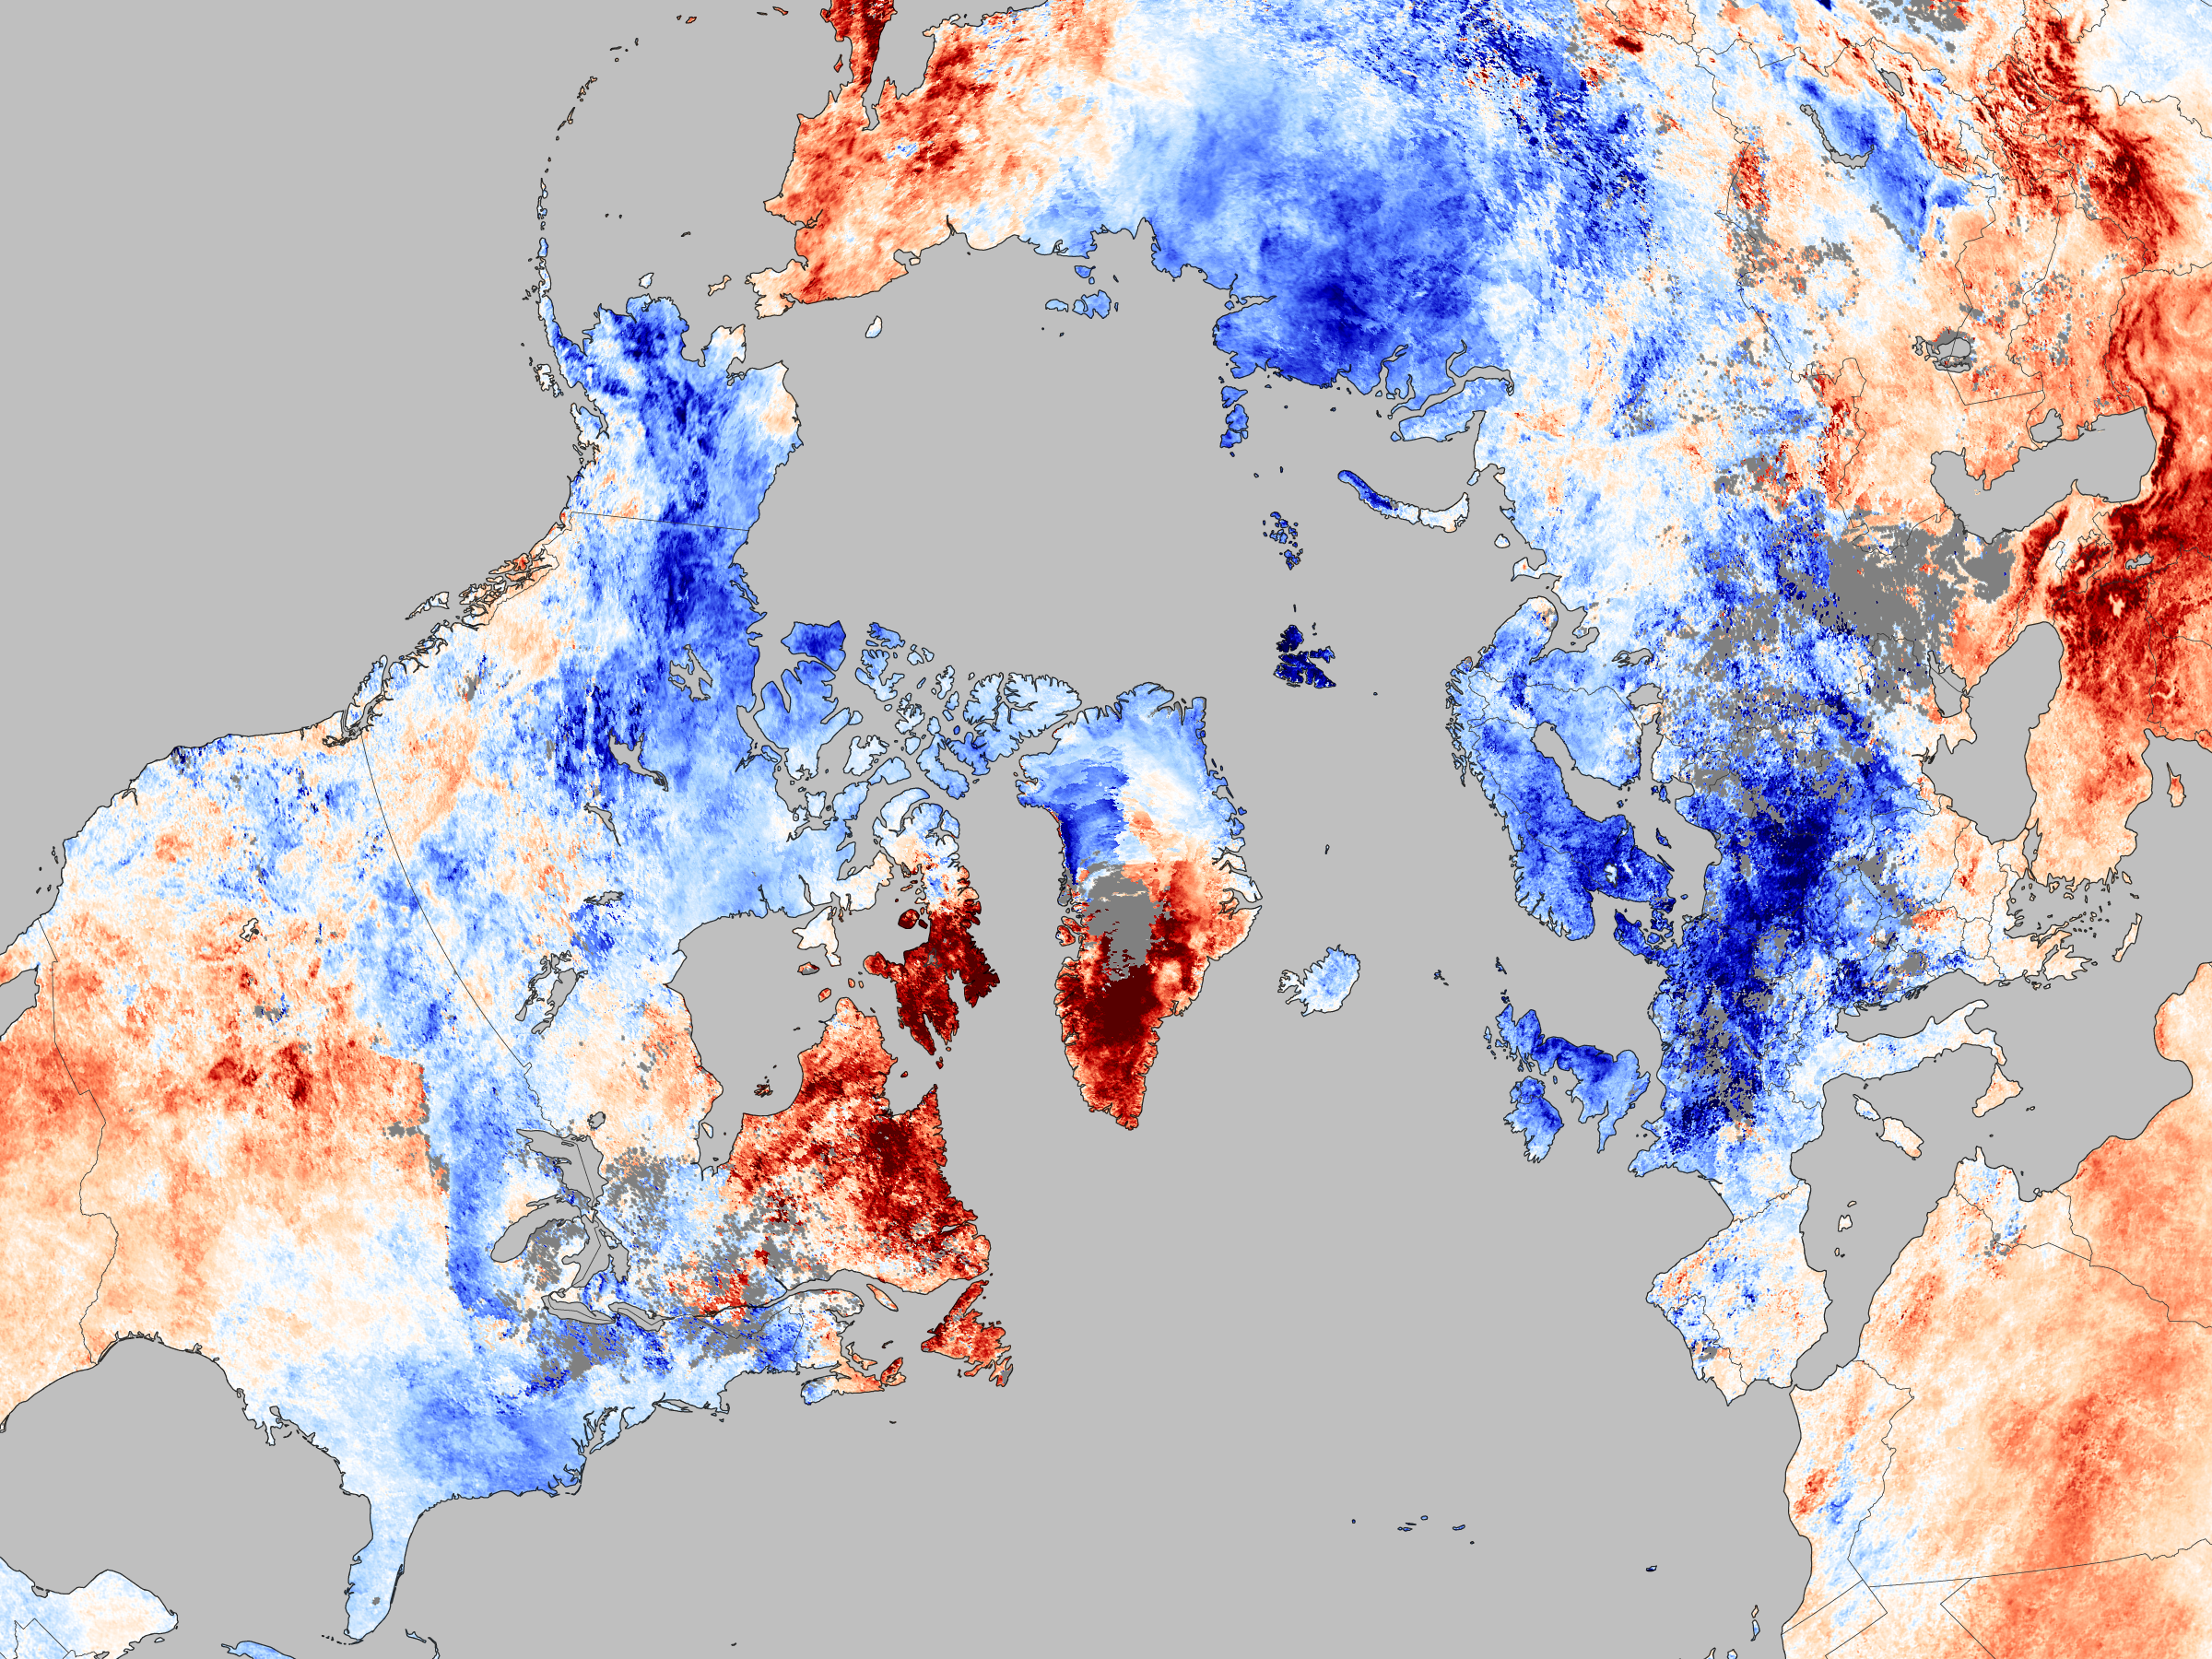 NASA image of frozen Northern Hemisphere